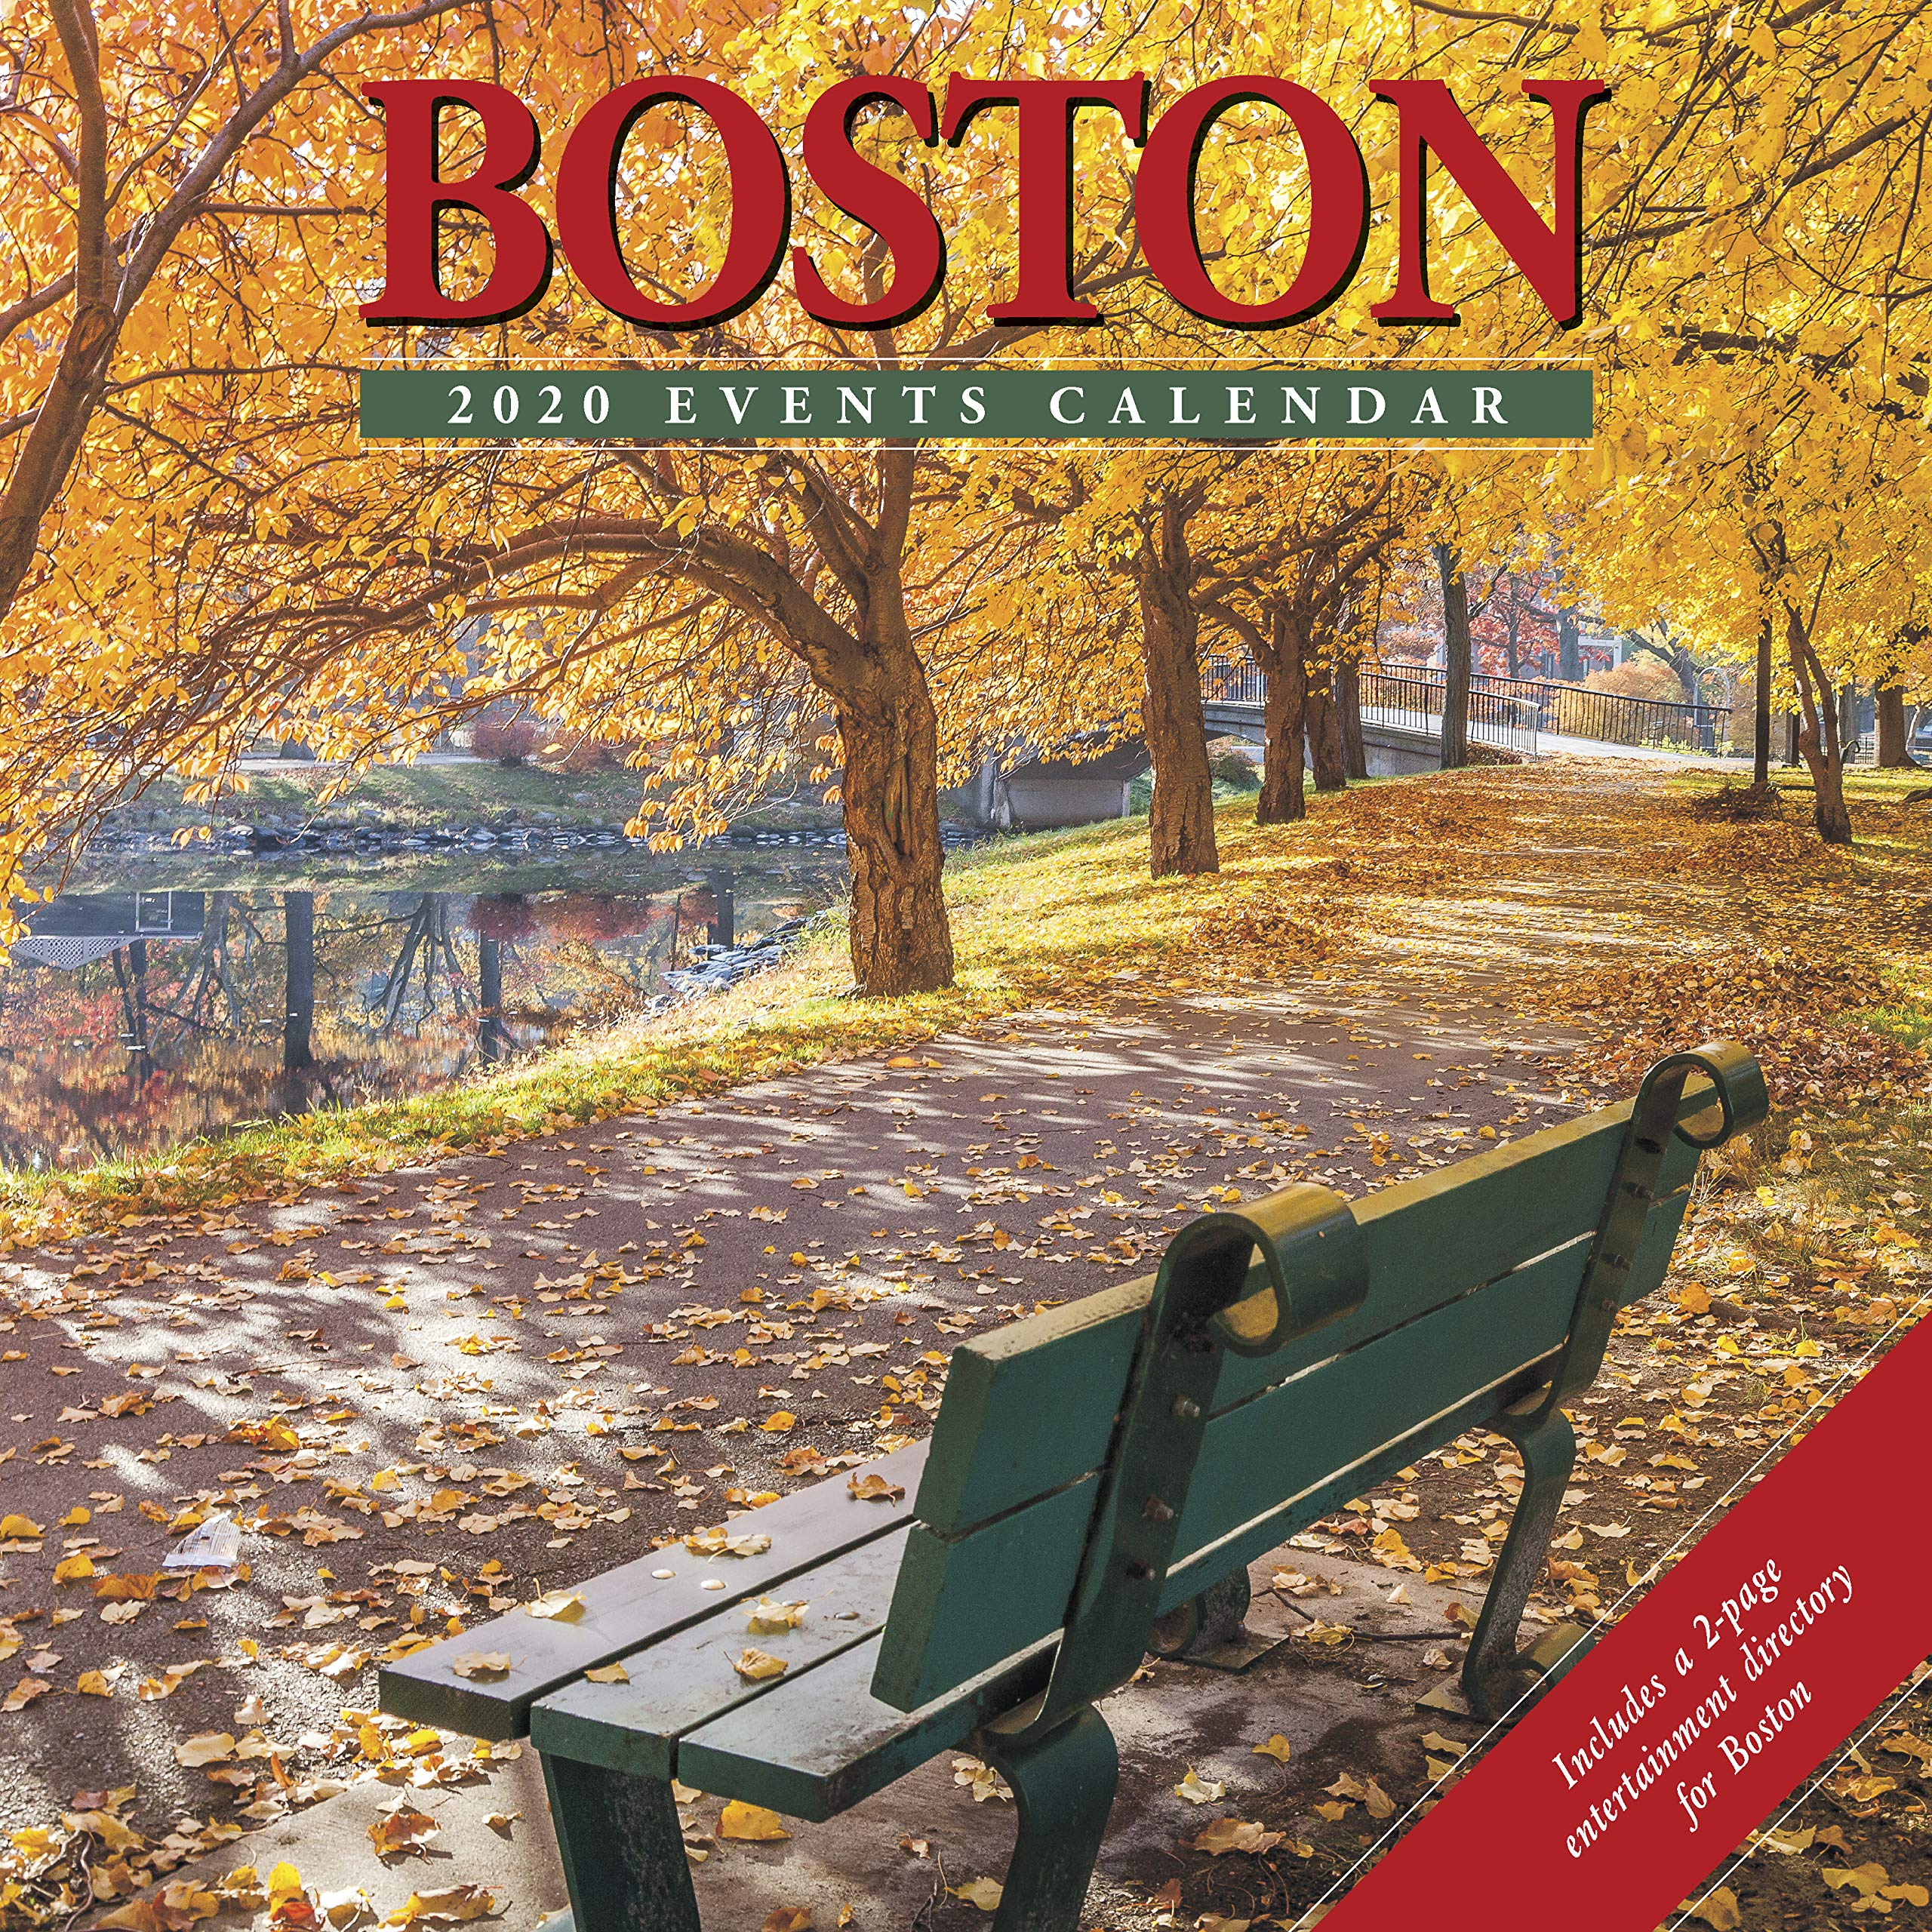 Boston Event Calendar 2020 Boston 2020 Wall Calendar: Willow Creek Press: 9781549205491